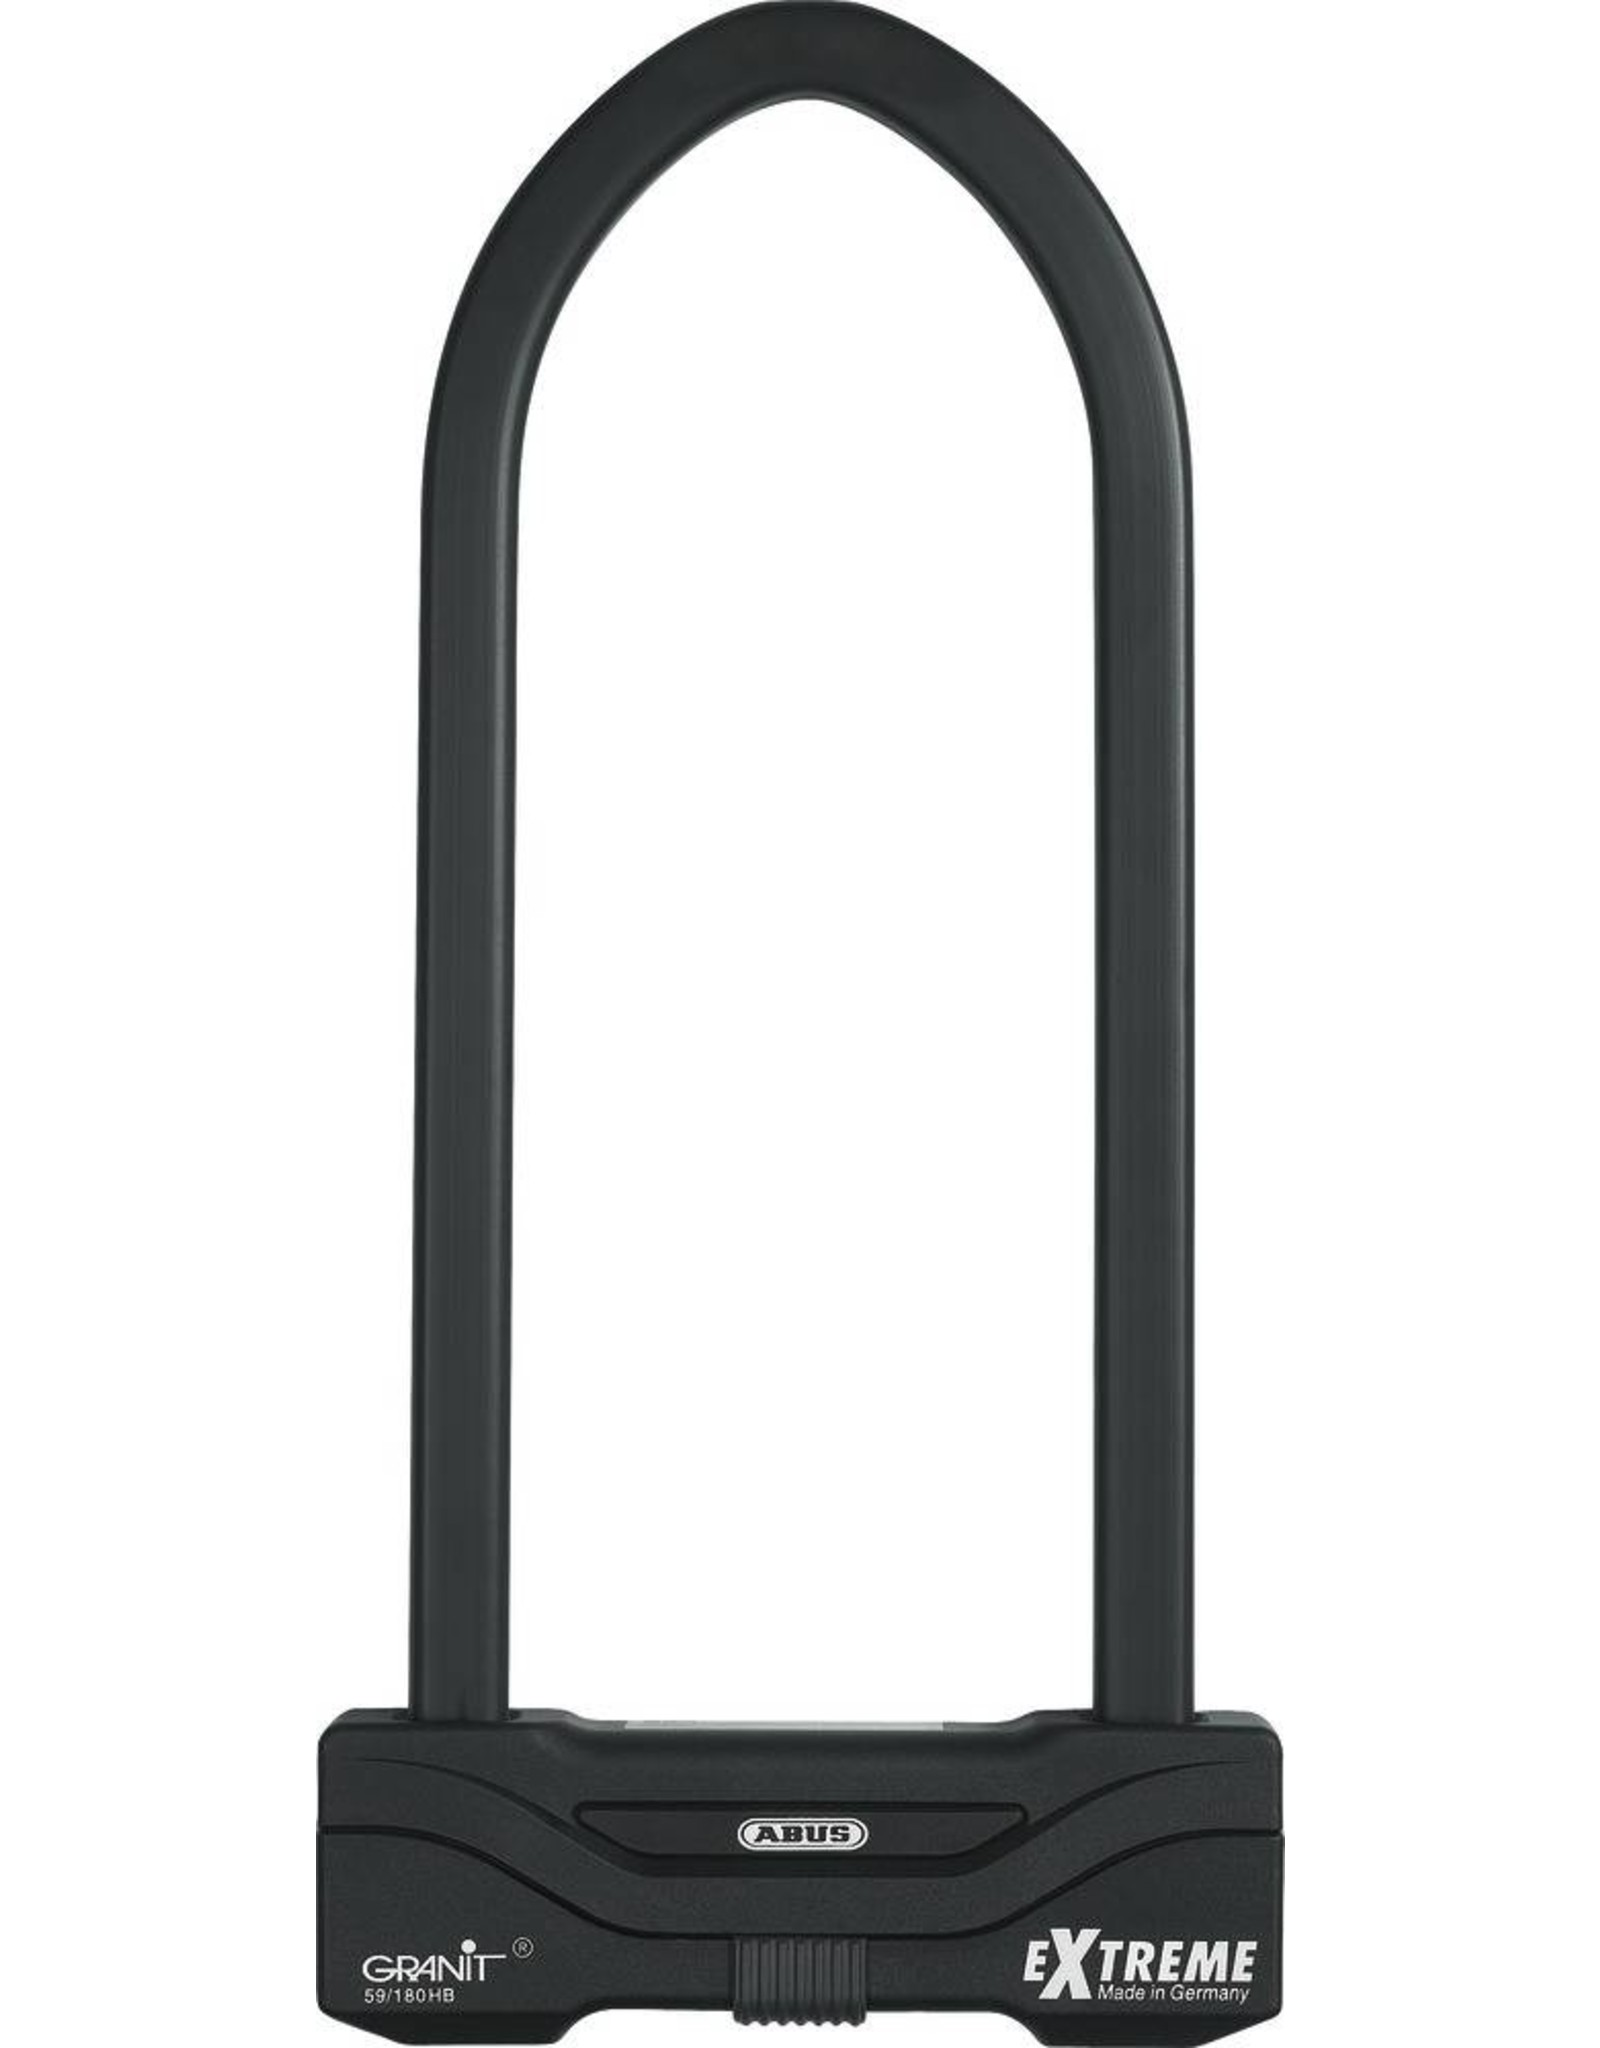 ABUS ABUS GRANIT Extreme U-Lock